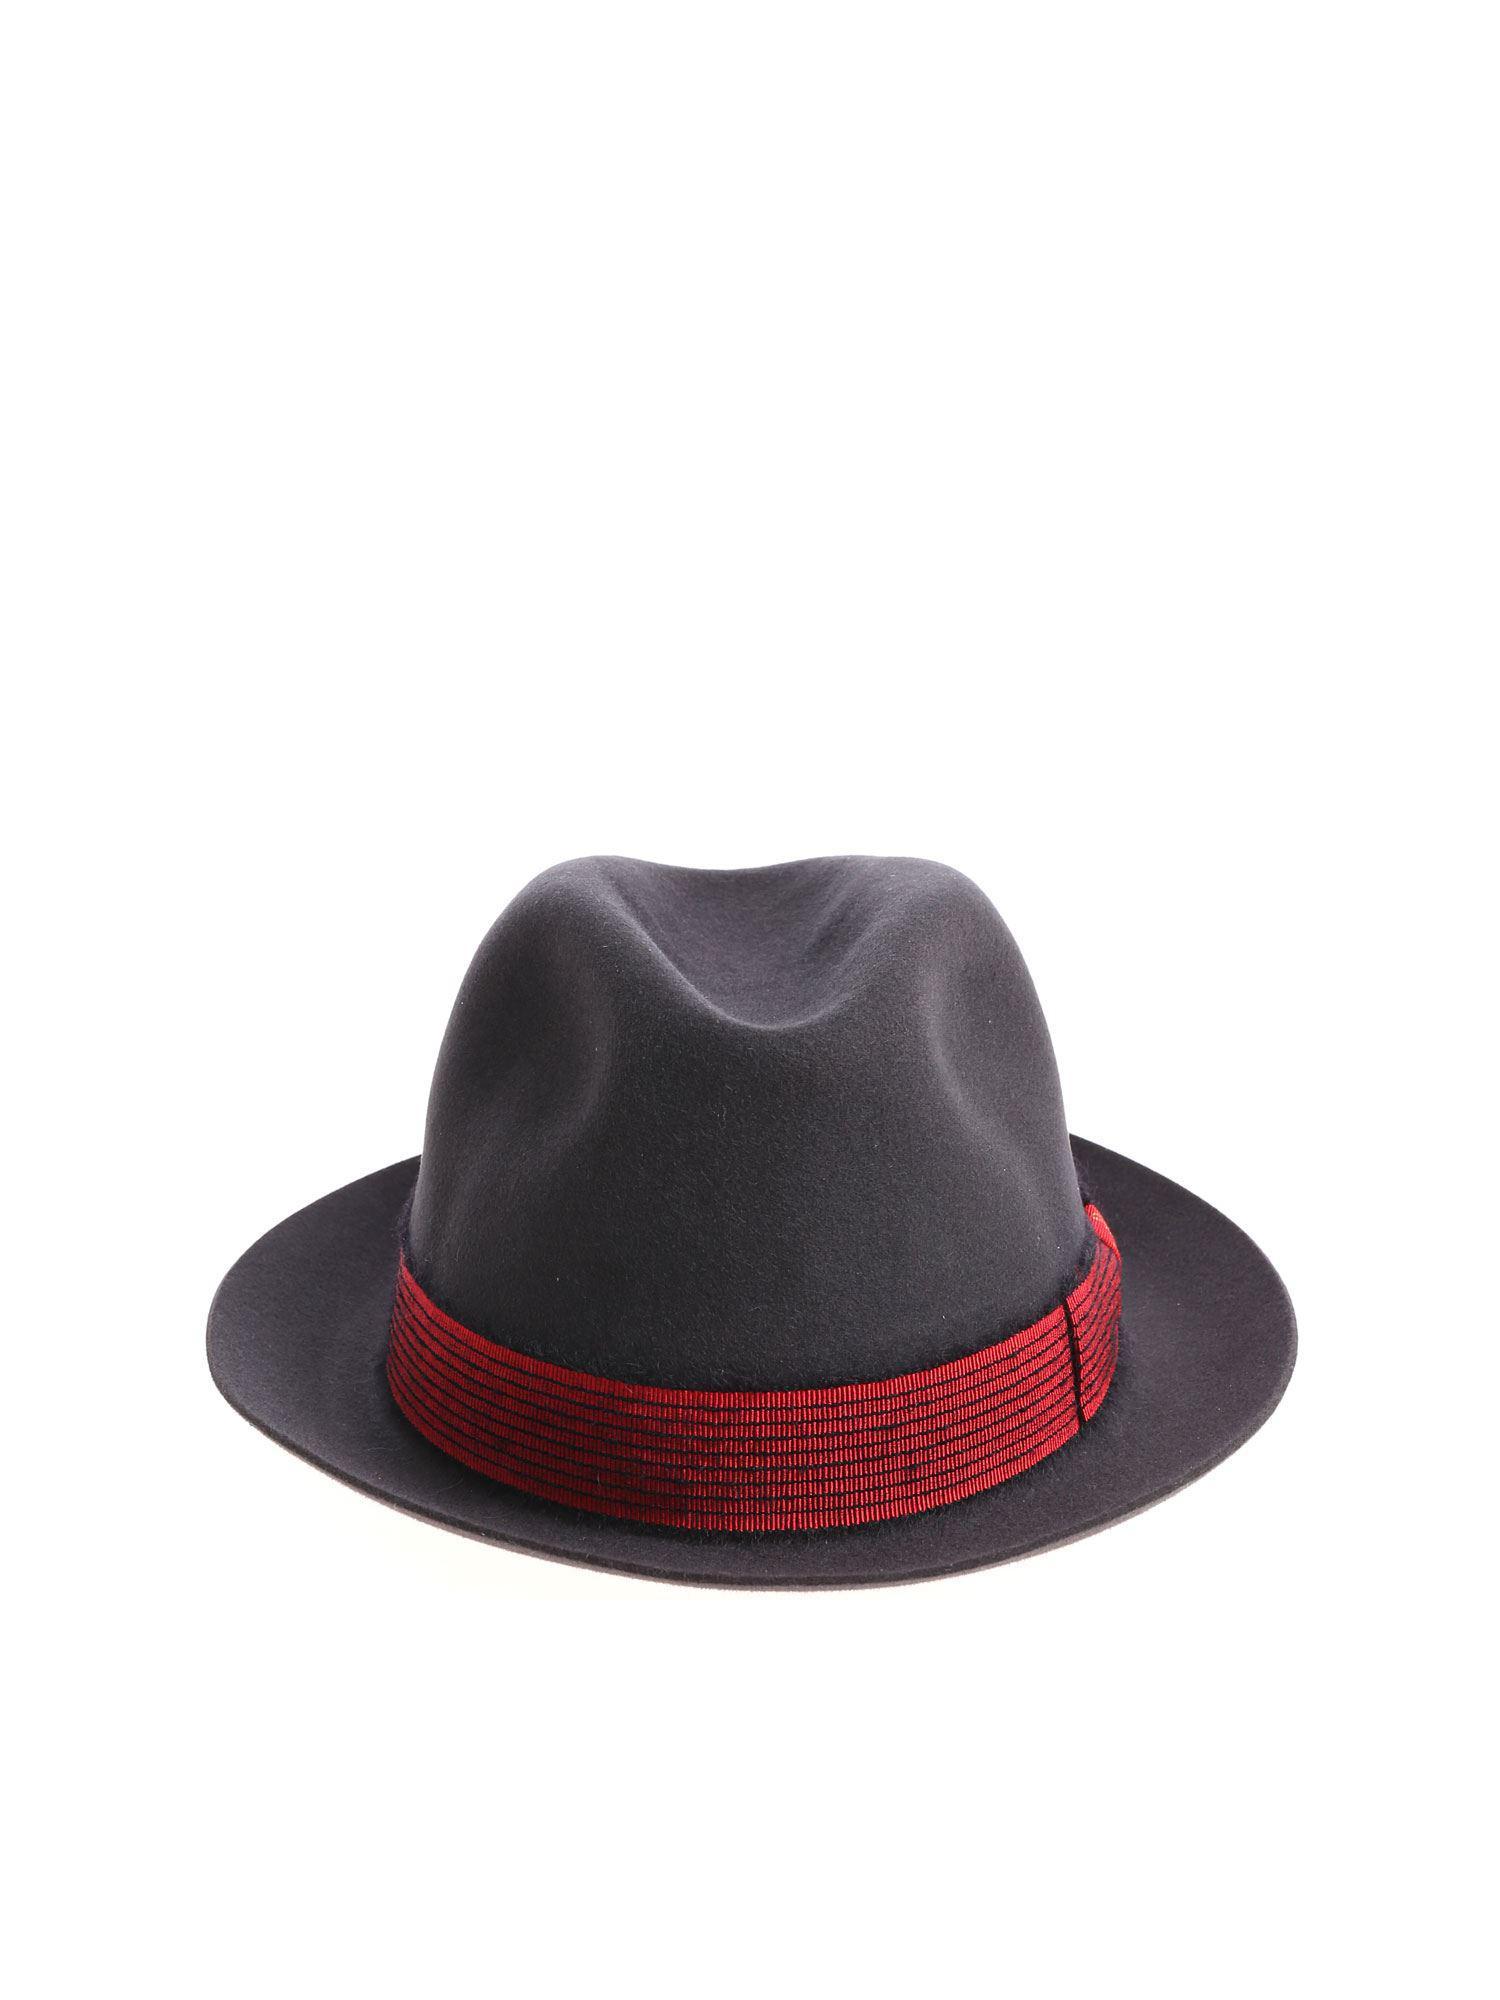 8da164de3e4 Lyst - Borsalino Dark Grey Felt Alessandria Hat in Gray for Men